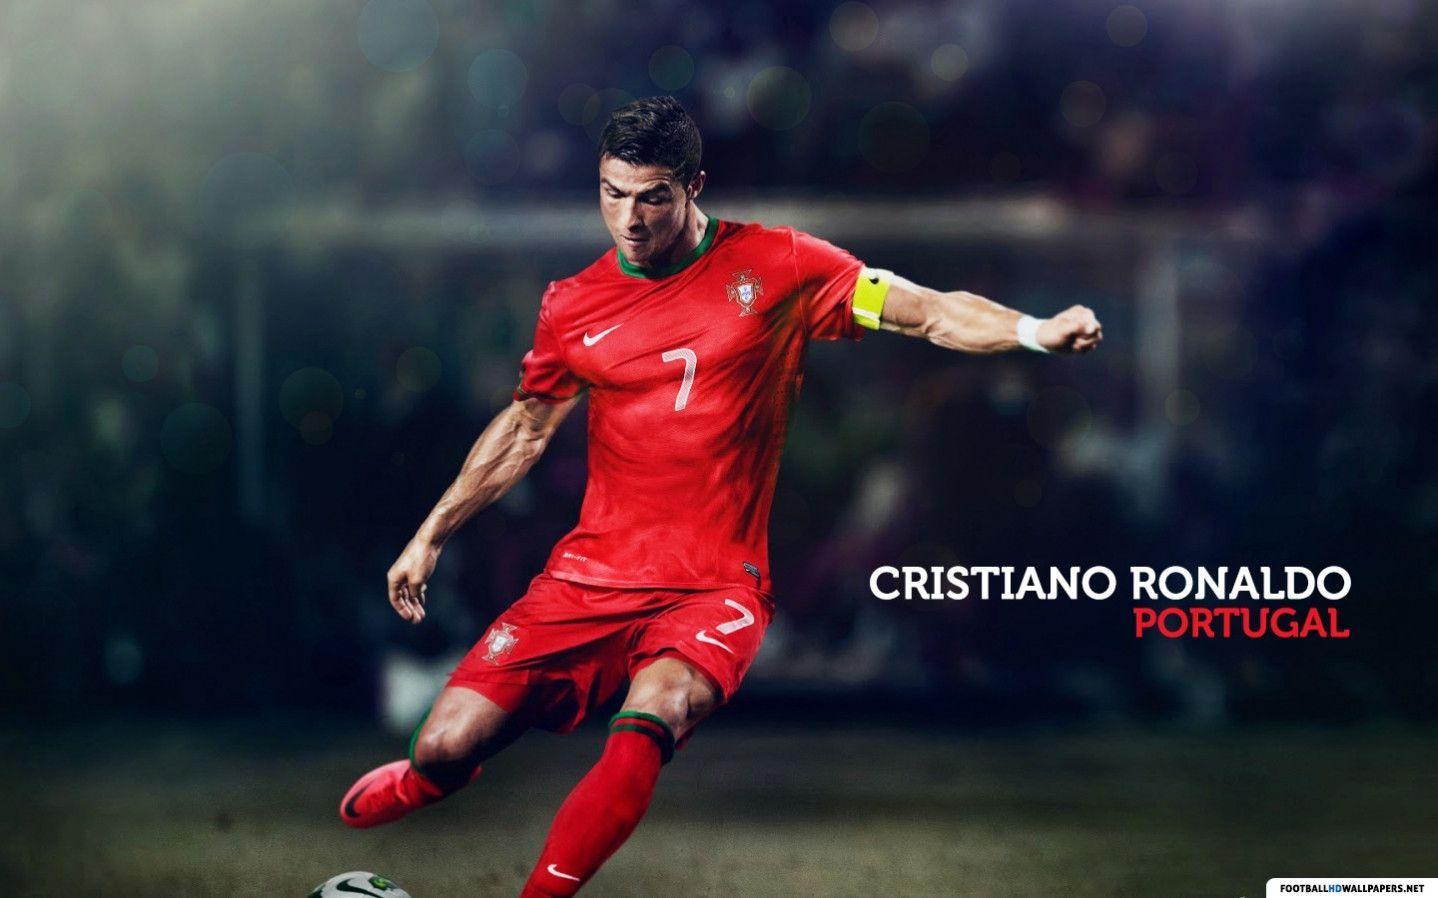 HD-Football-wallpaper-wpc900237